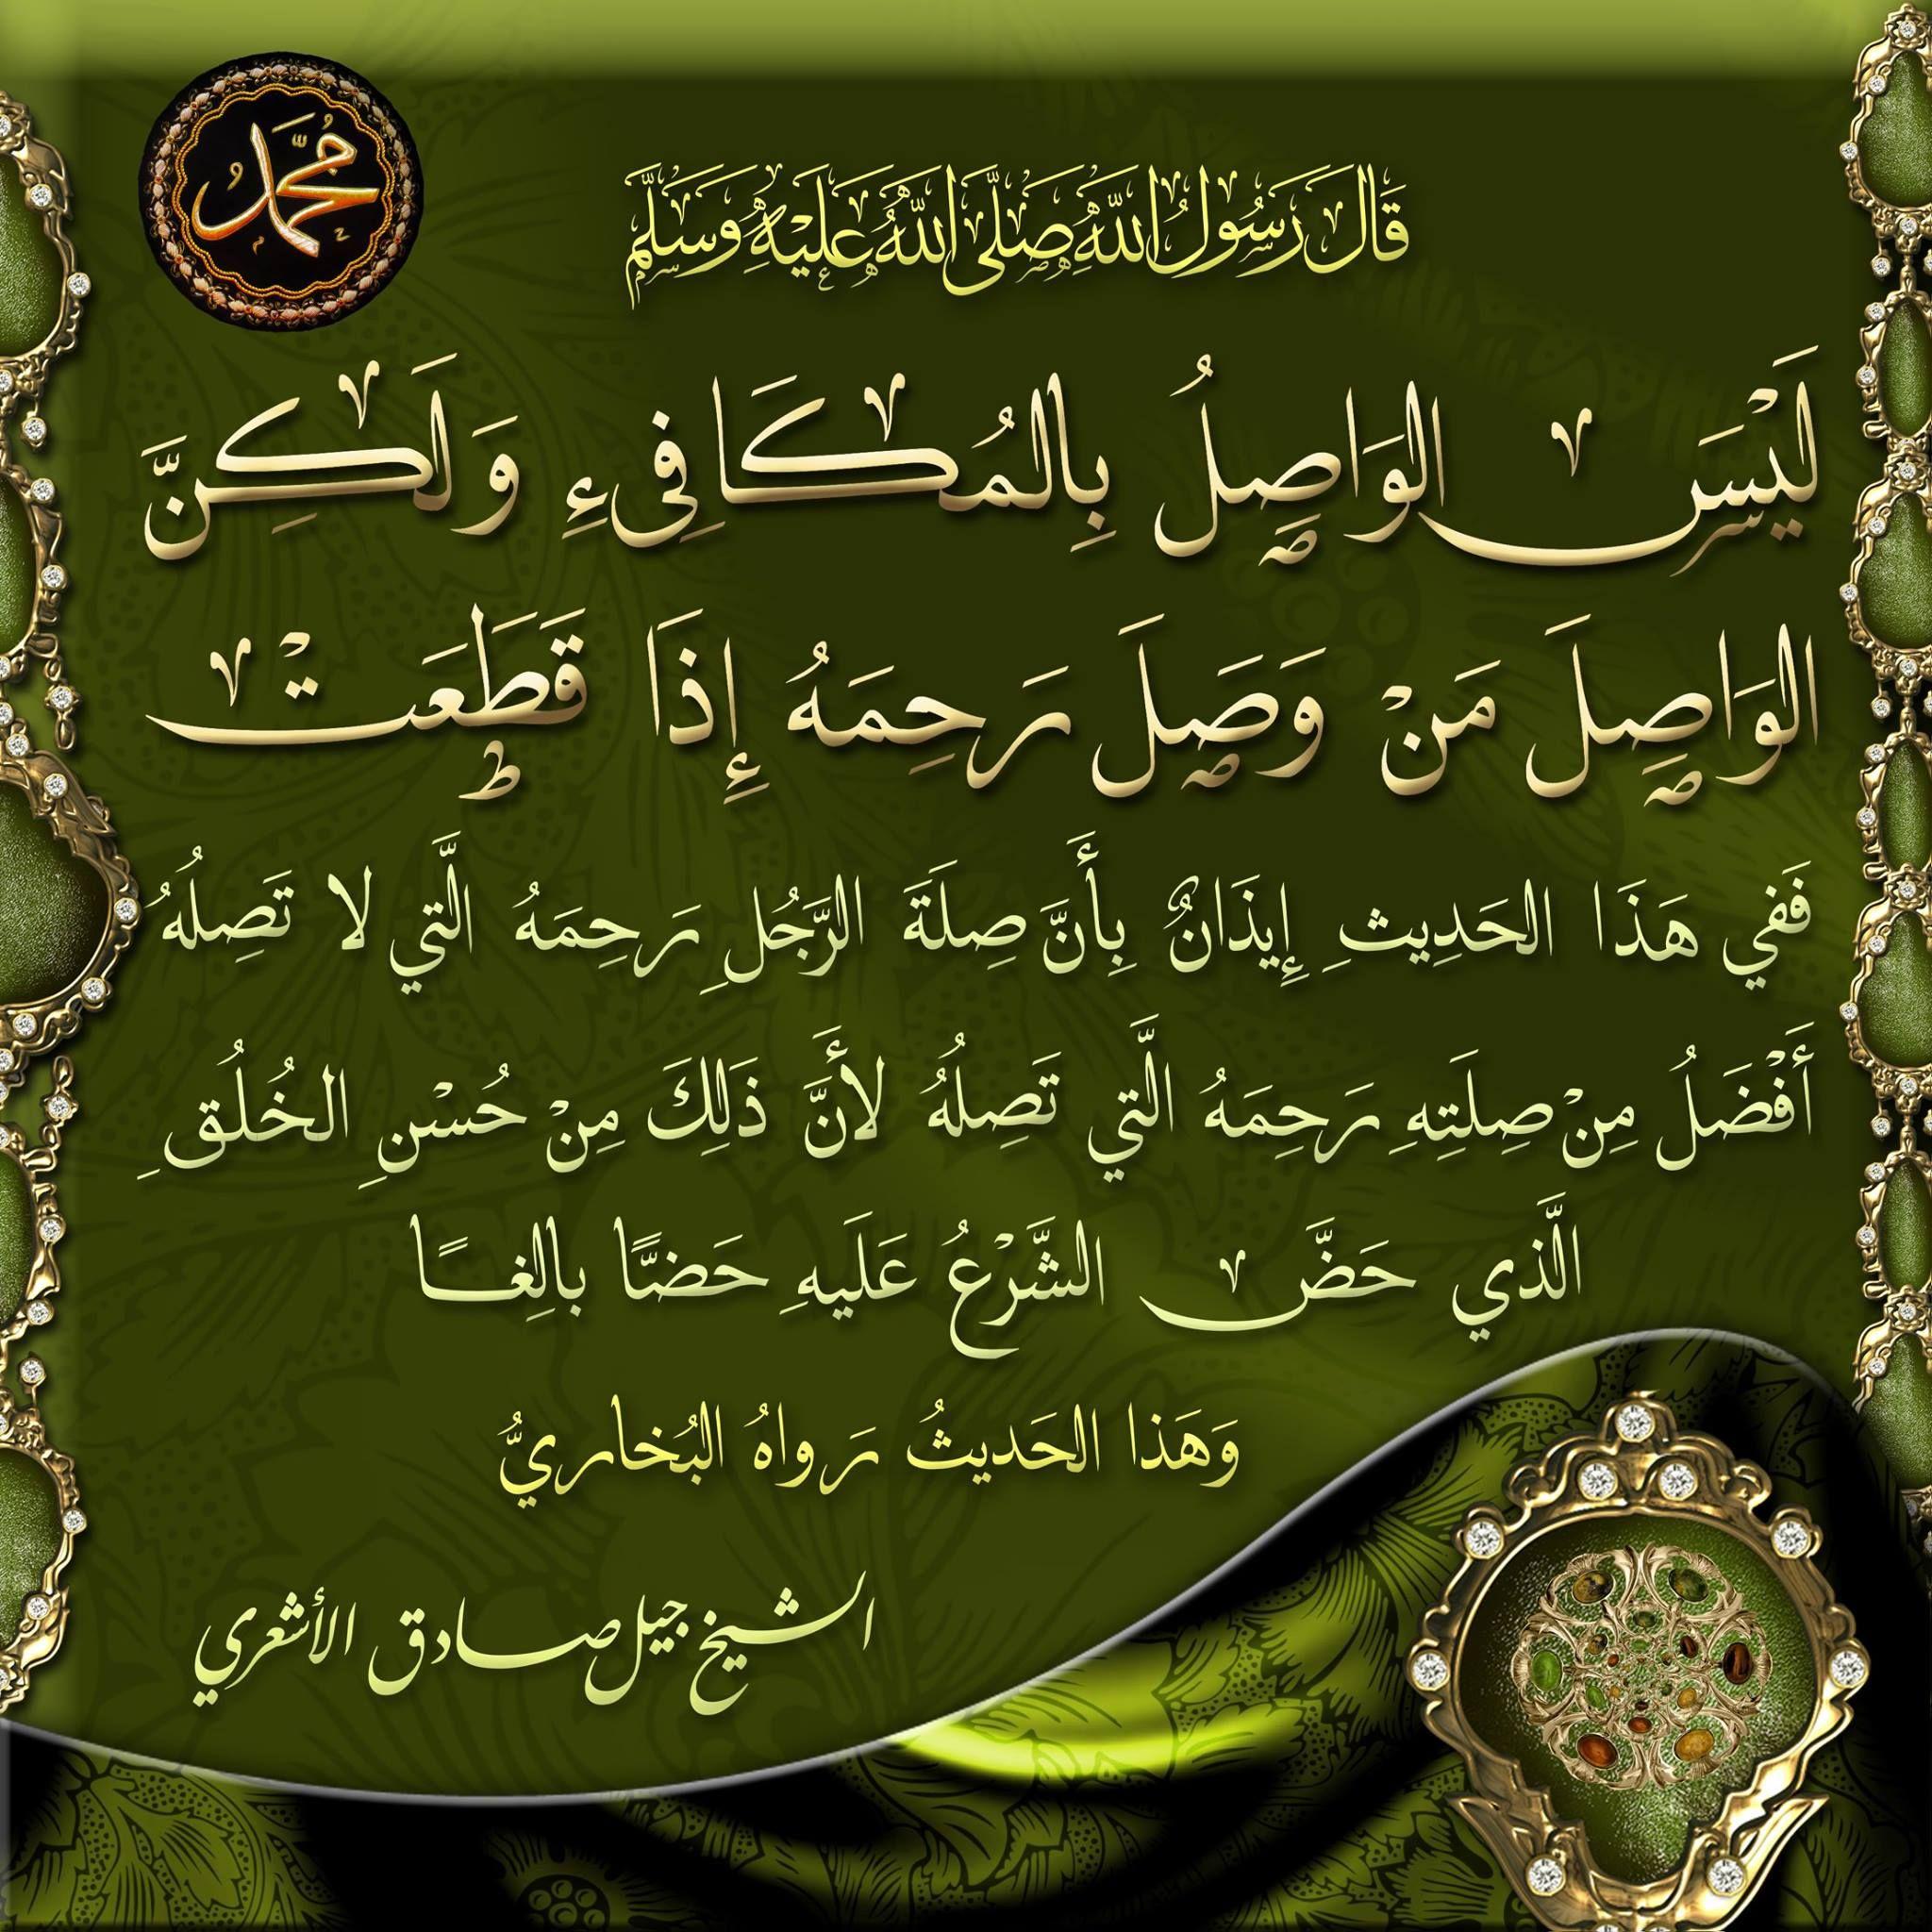 Fb Com Shaykh Gilles Sadek Whatsapp 15148244550 Twitter Shaykhgilles Instagram Shaykhgilles Telegram Shaykh Gilles Sadek Https Islamic Dua Quran Hadith